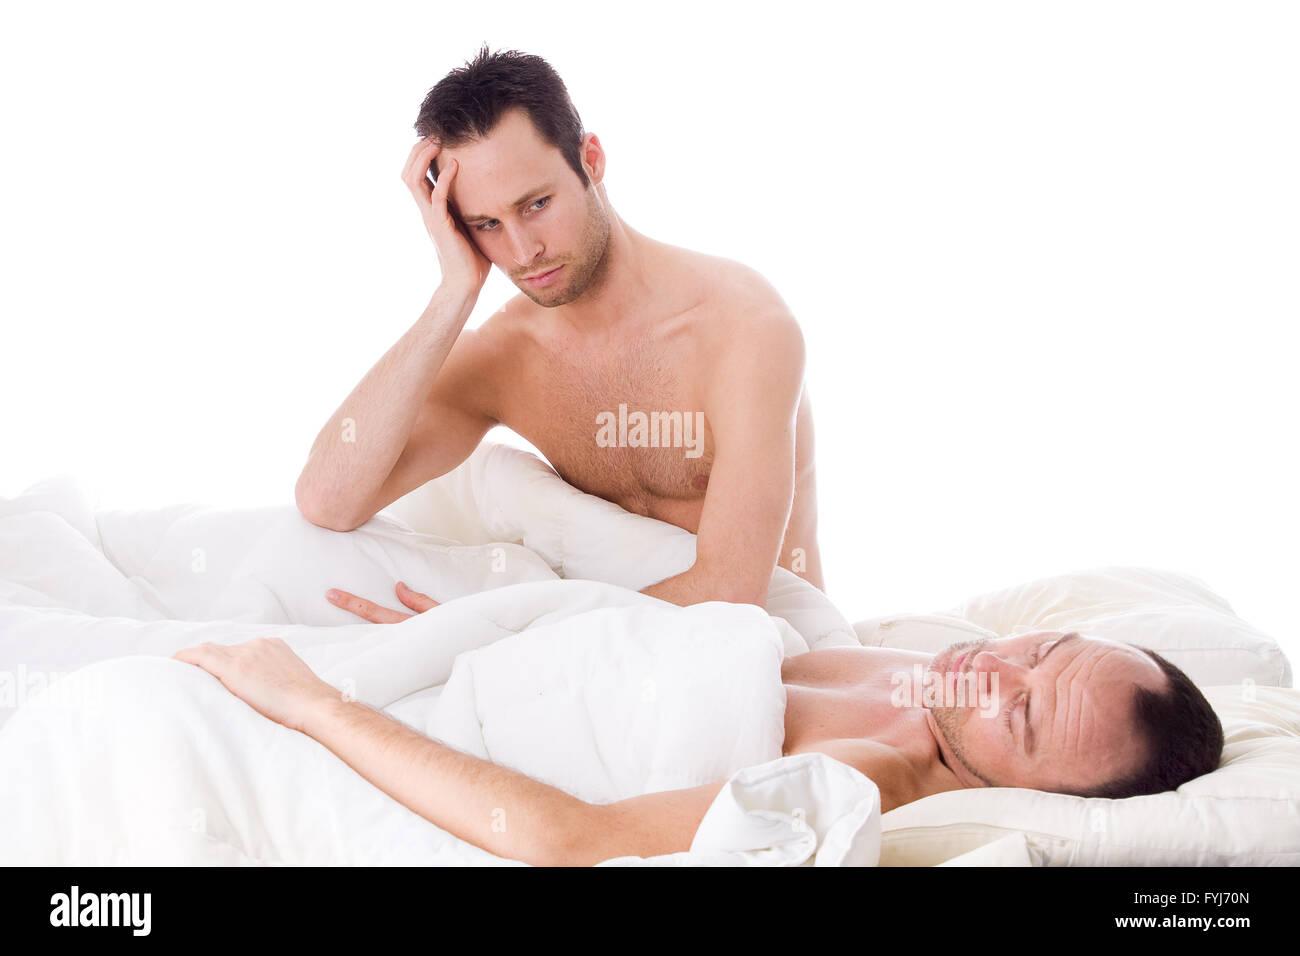 Homo relation trouble - Stock Image